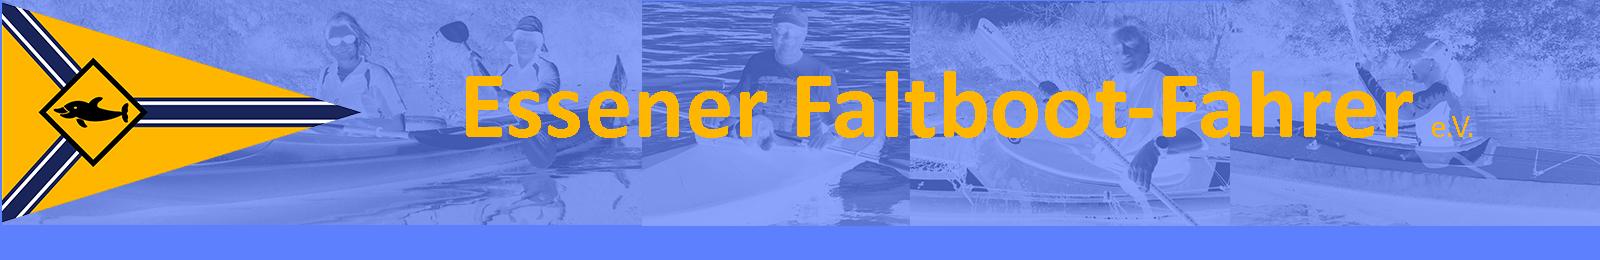 Essener Faltboot-Fahrer